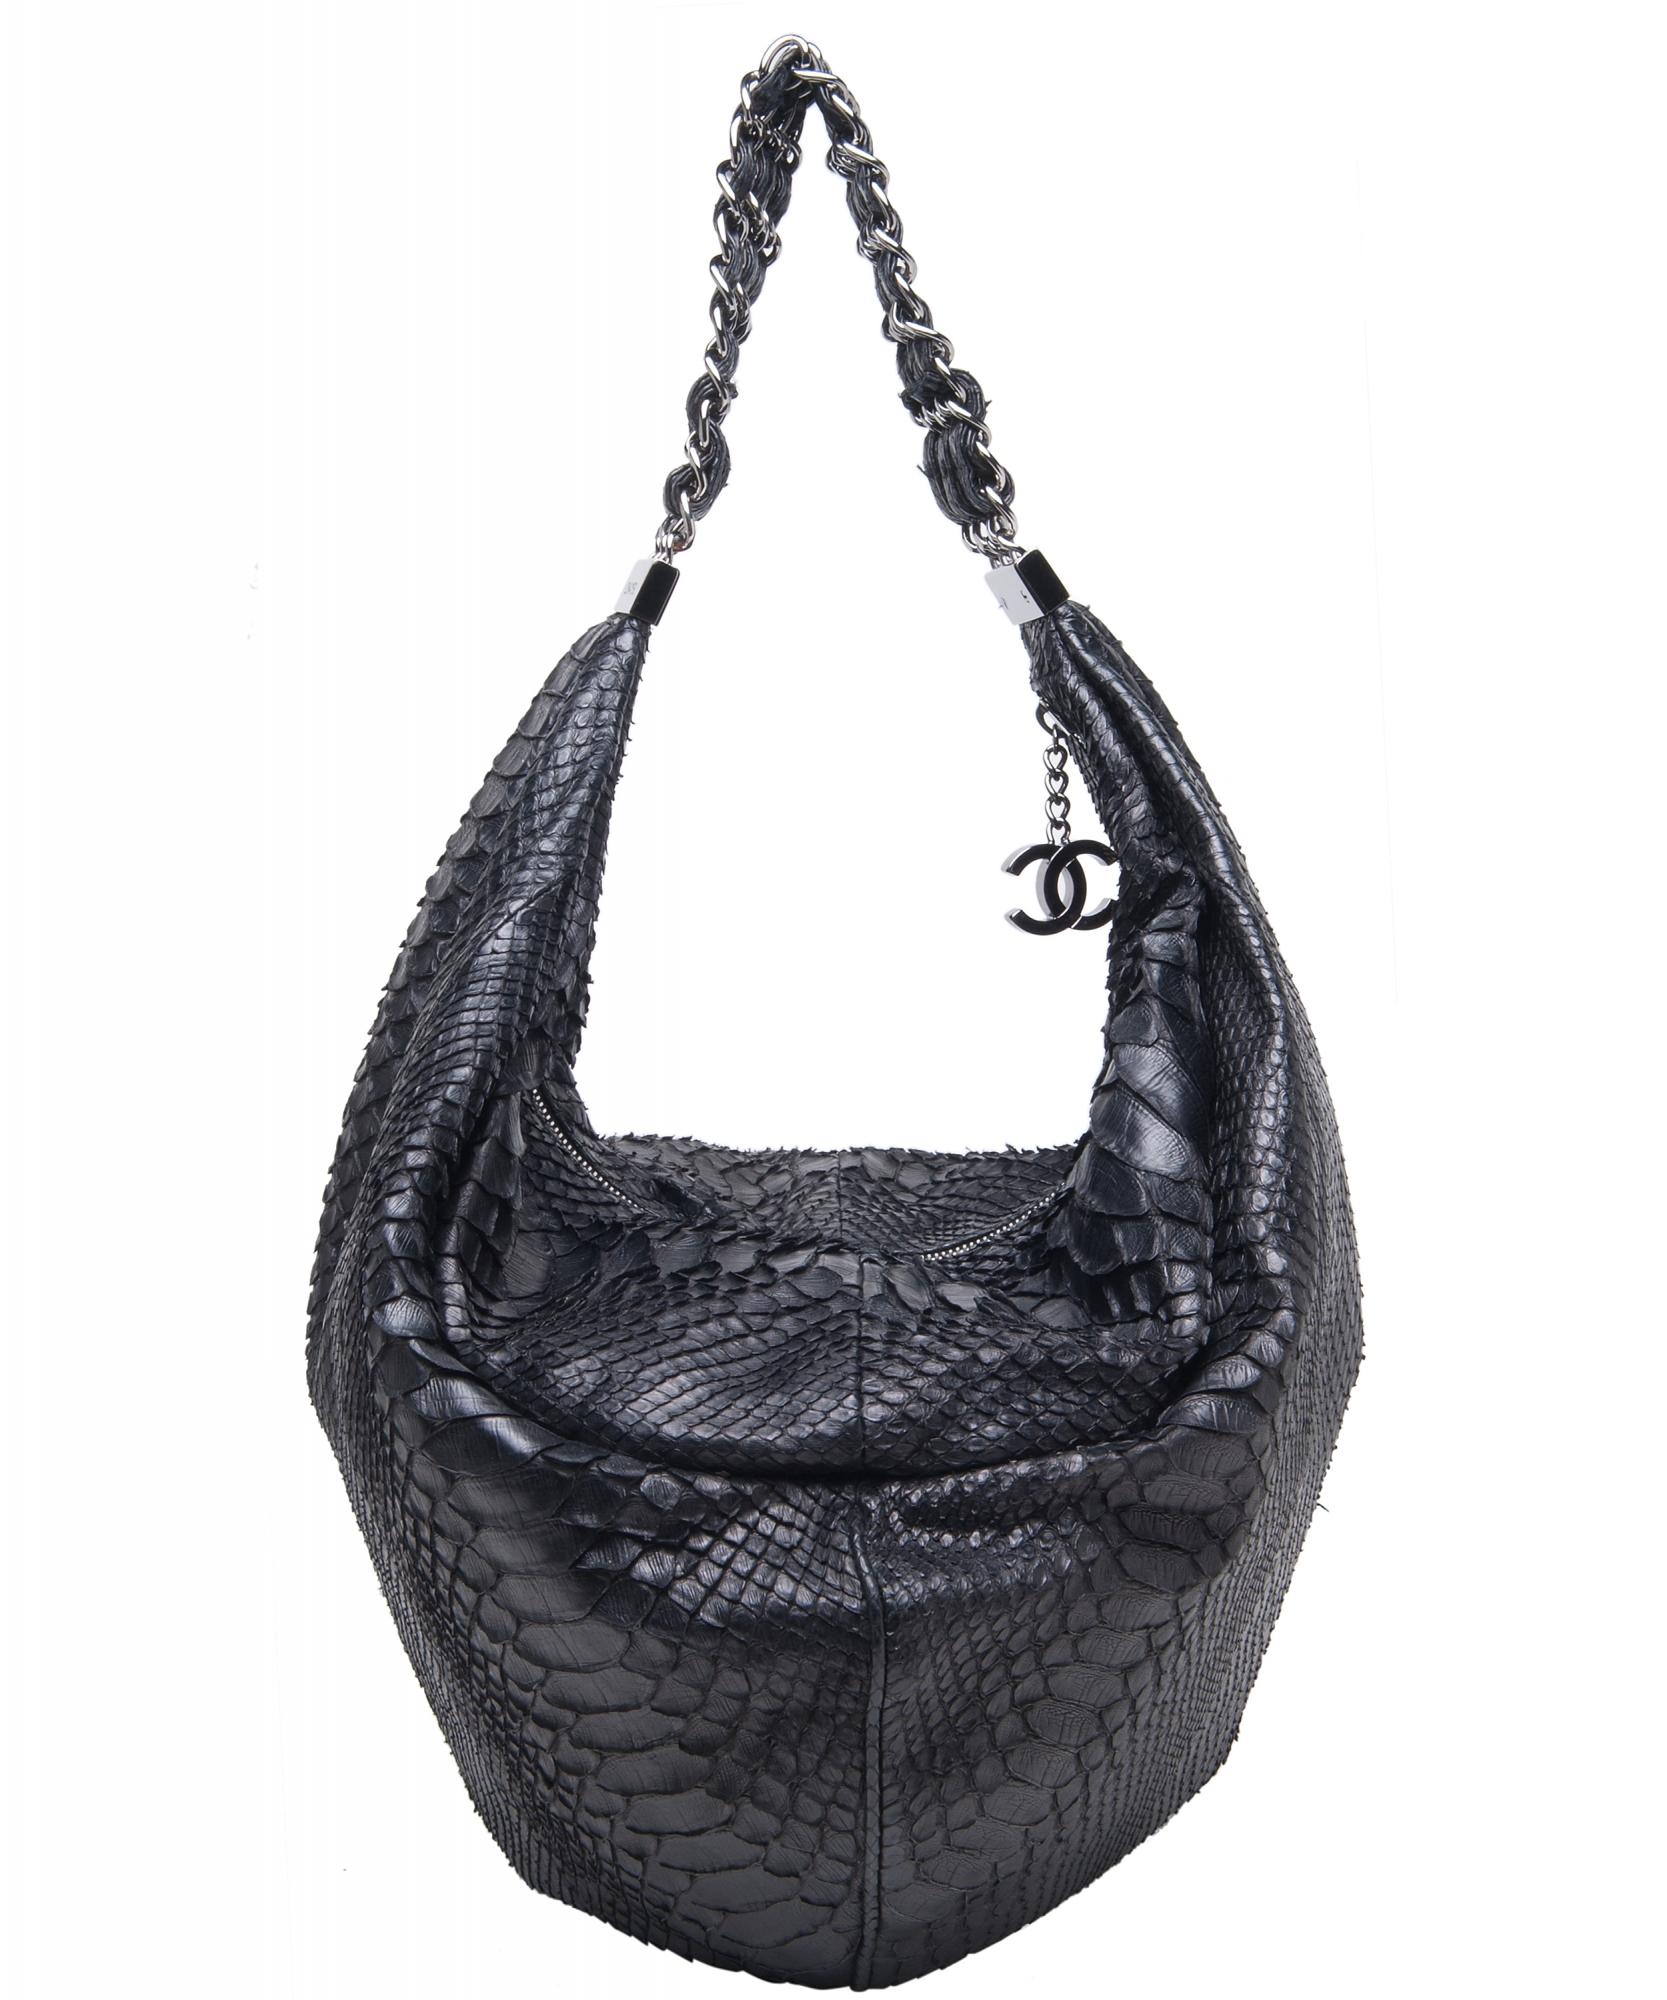 3f27ea658335 Chanel Rock & Chain Python Hobo Bag - Limited Edition 2007   La Doyenne